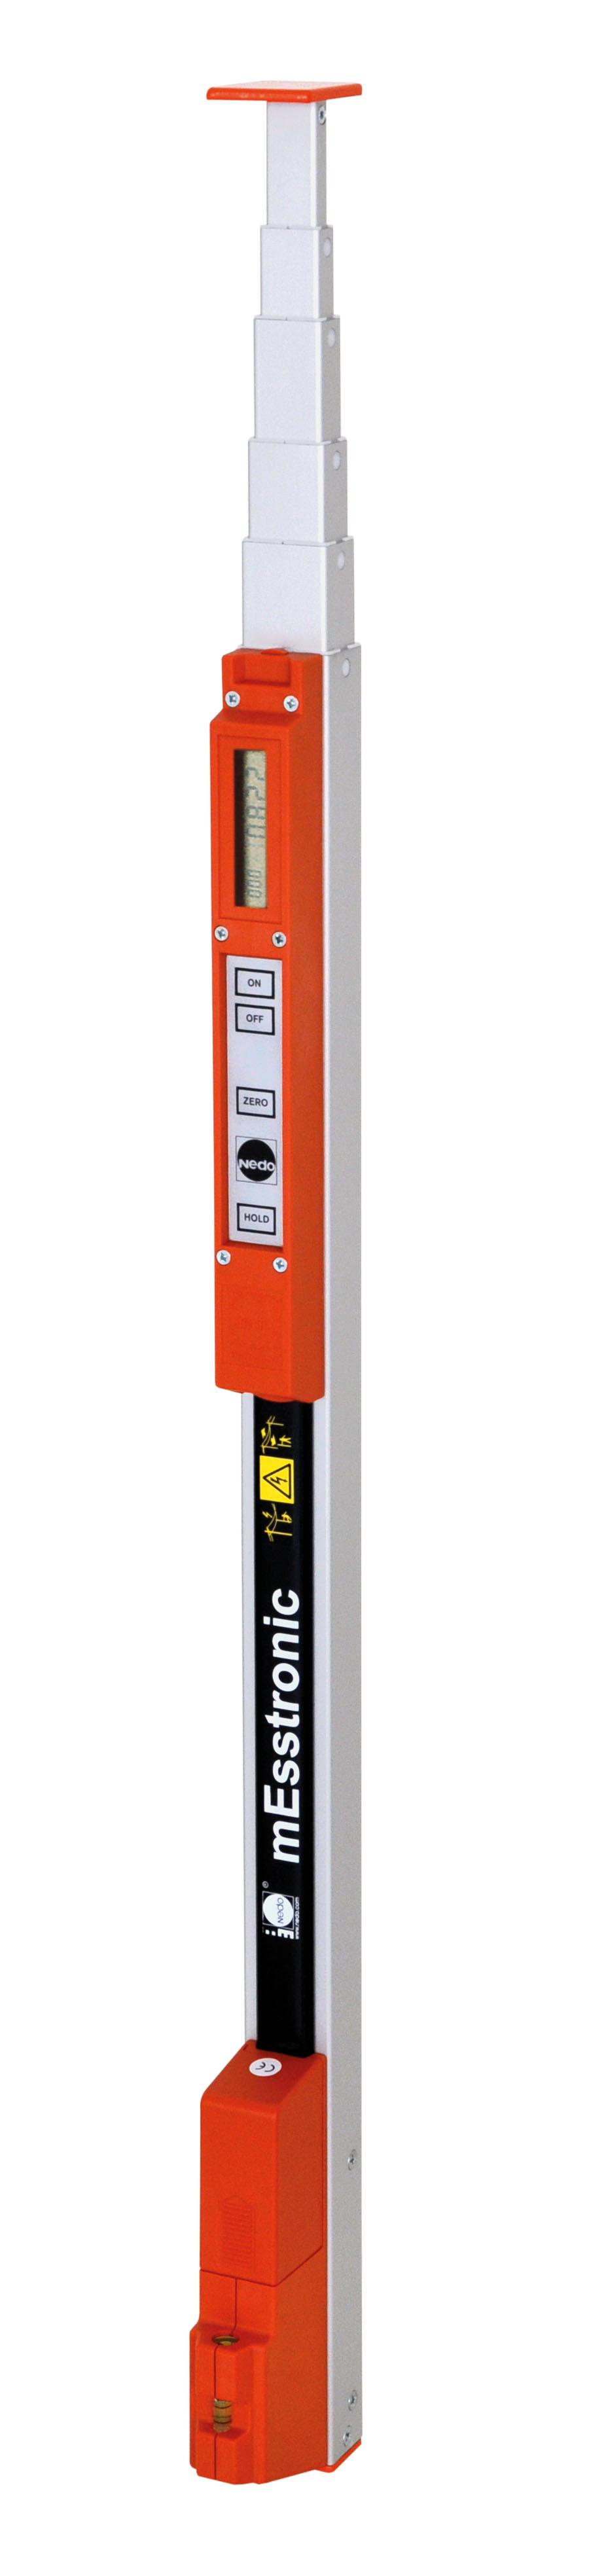 Telescómetro digital Messtronic Easy